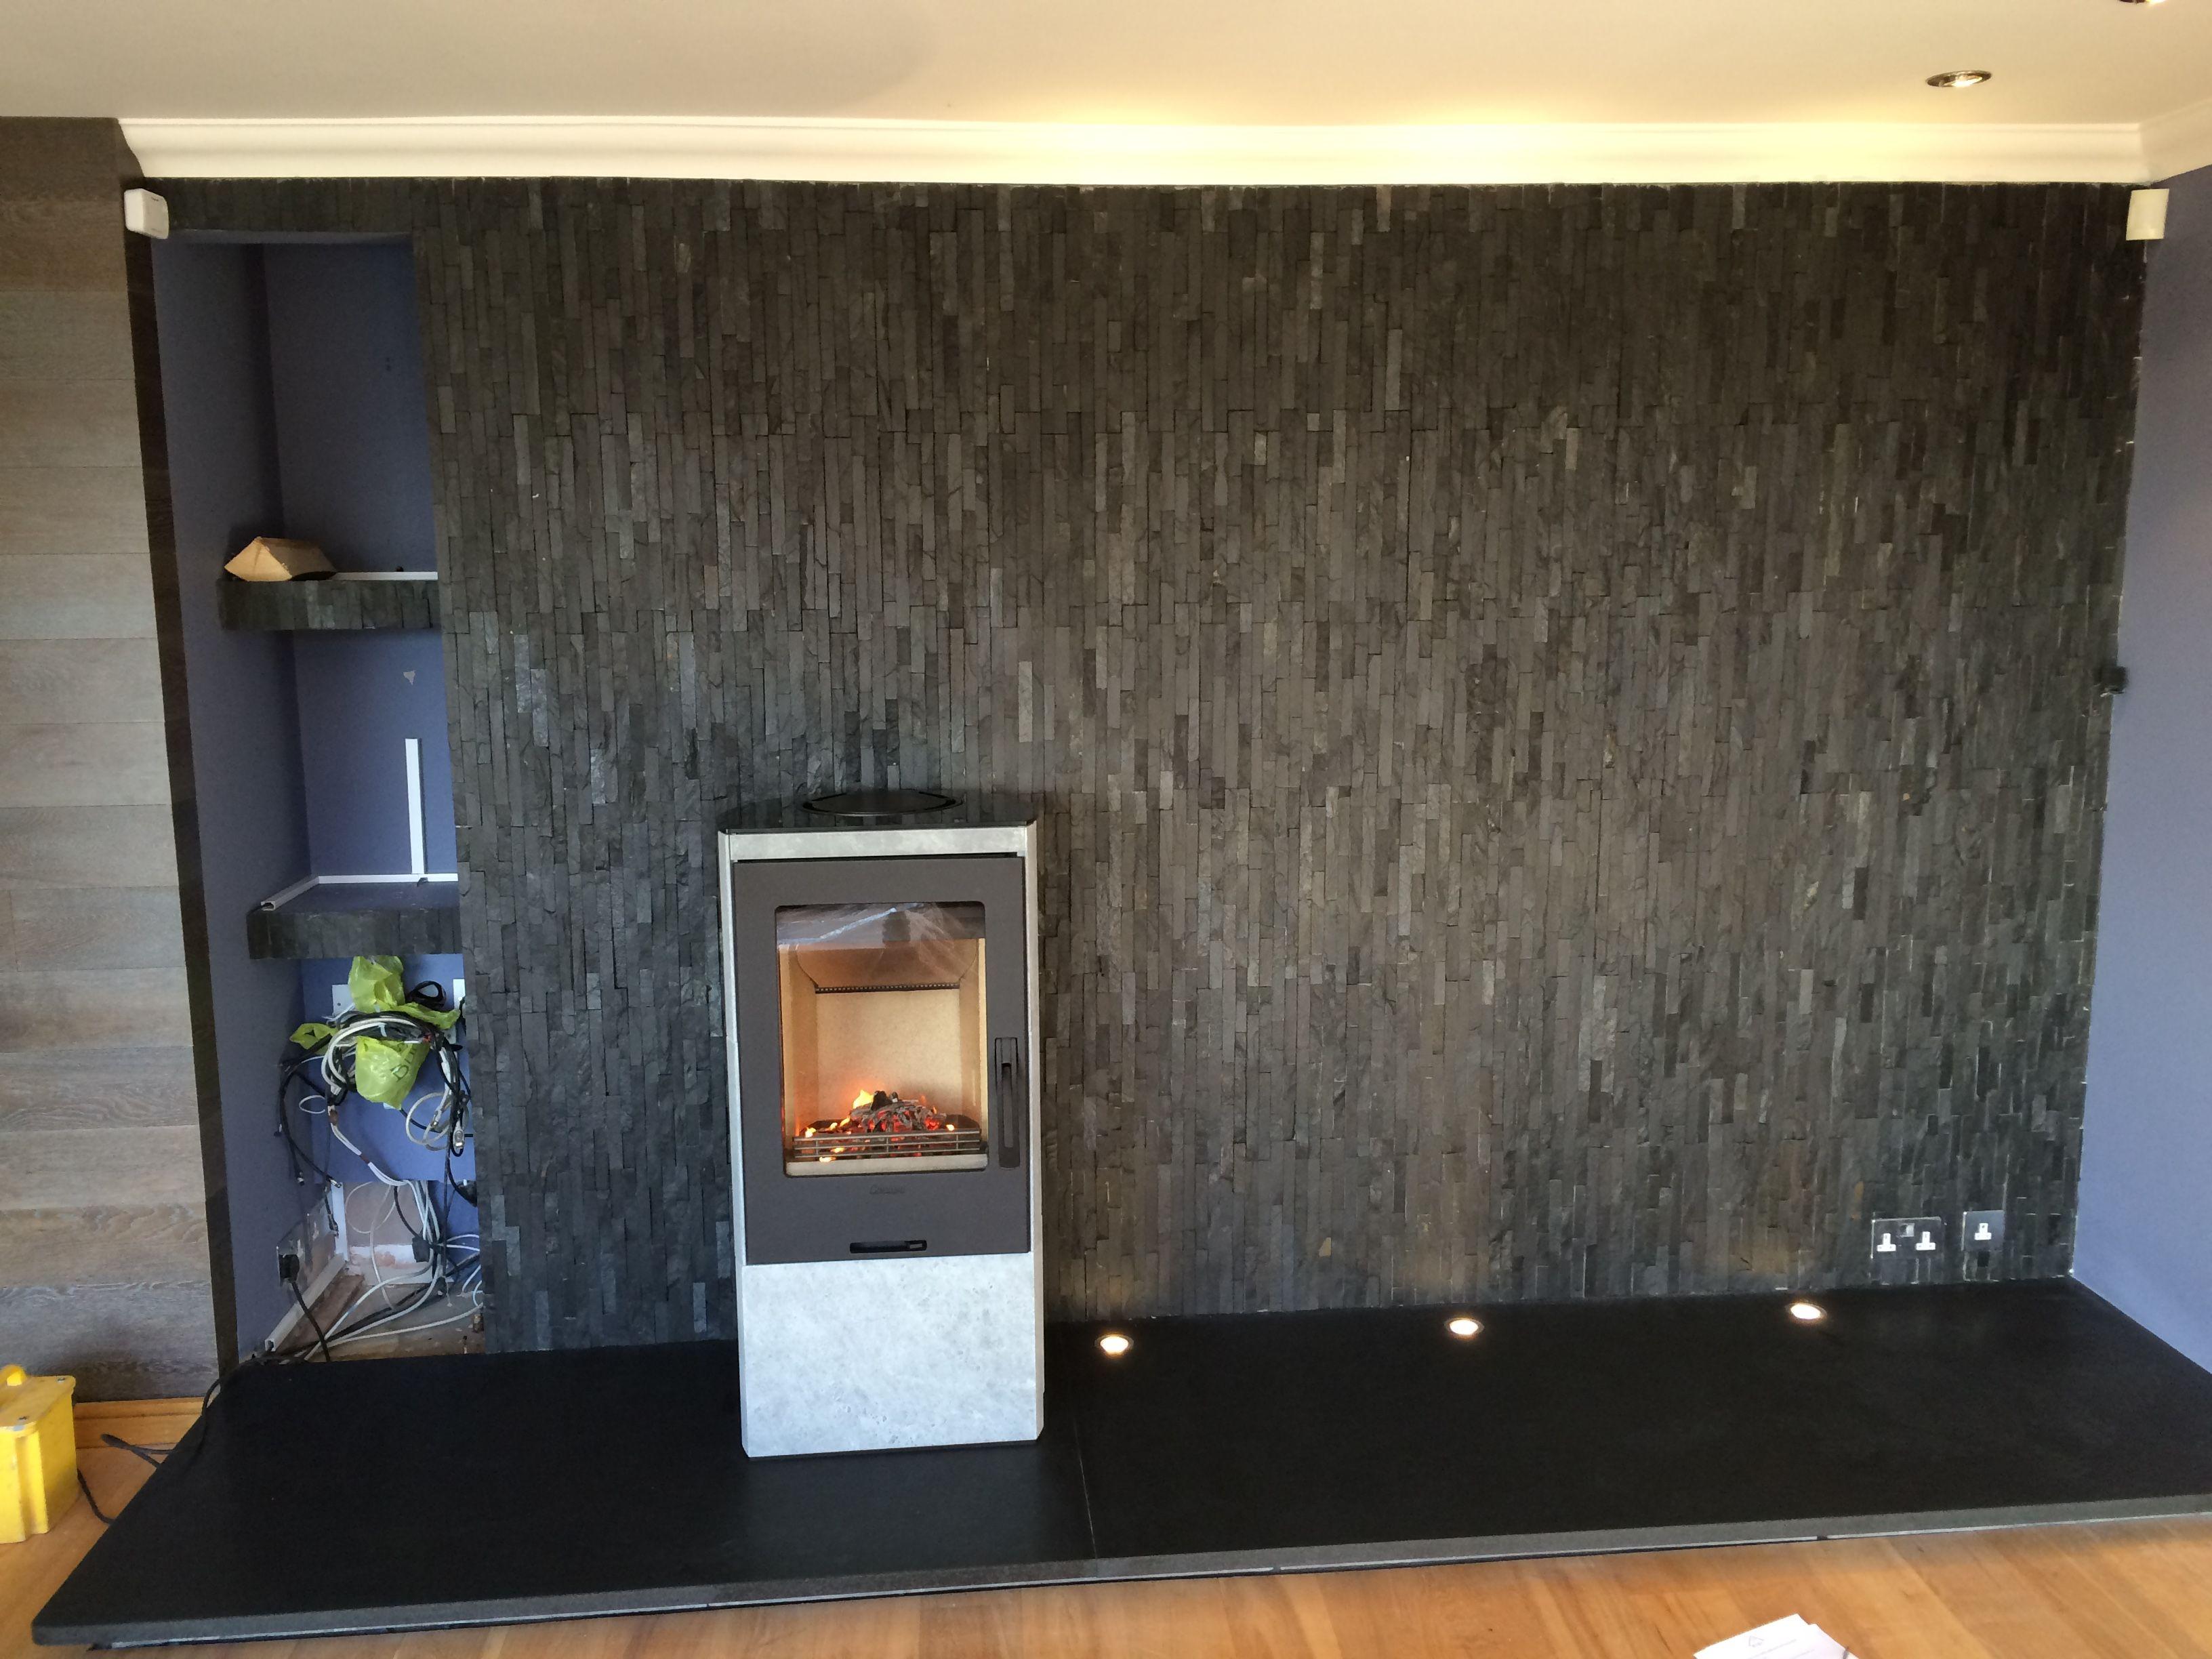 8 best contura 810 images on pinterest wood burning stoves